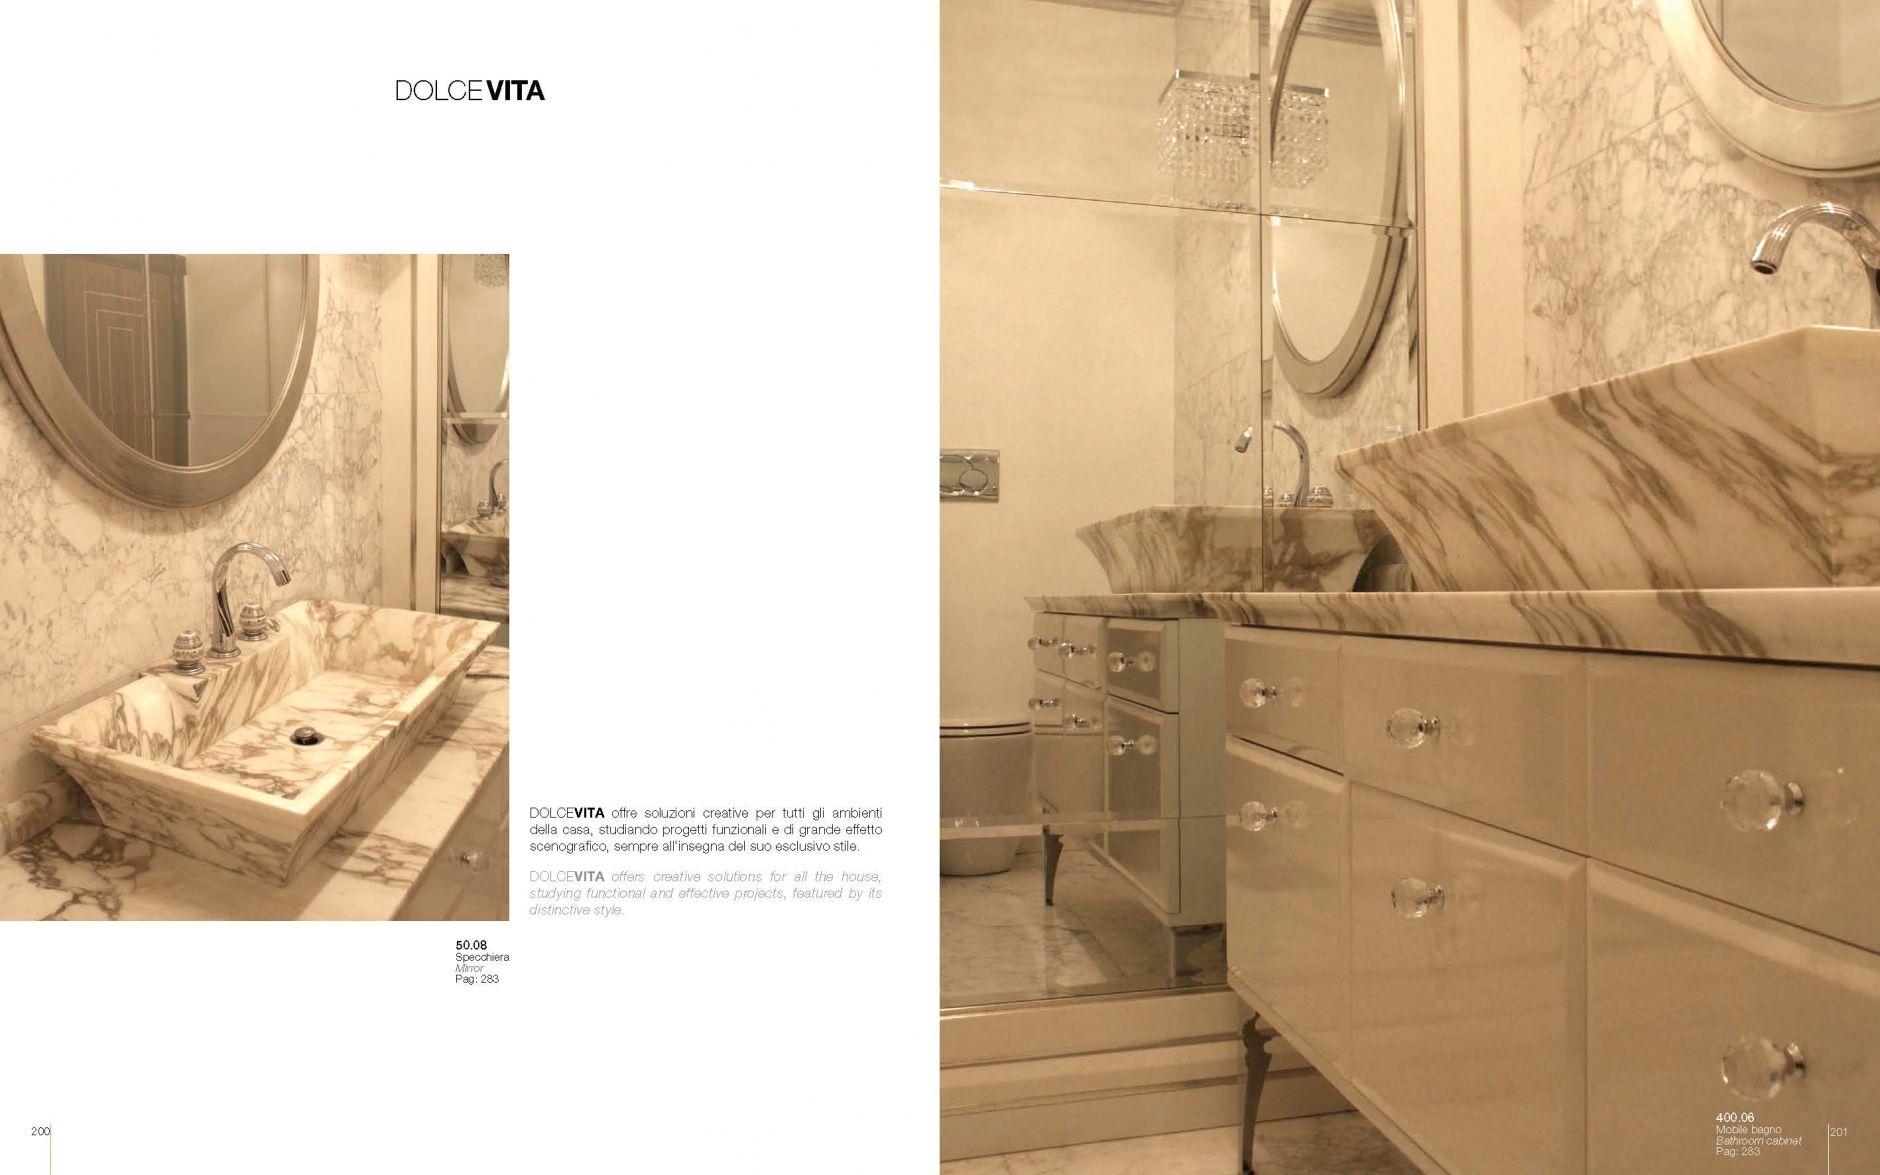 Muebles De Ba O Muebles De Ba O Serie Dolce Vita De Minomuebles  # Muebles Dolce Vita